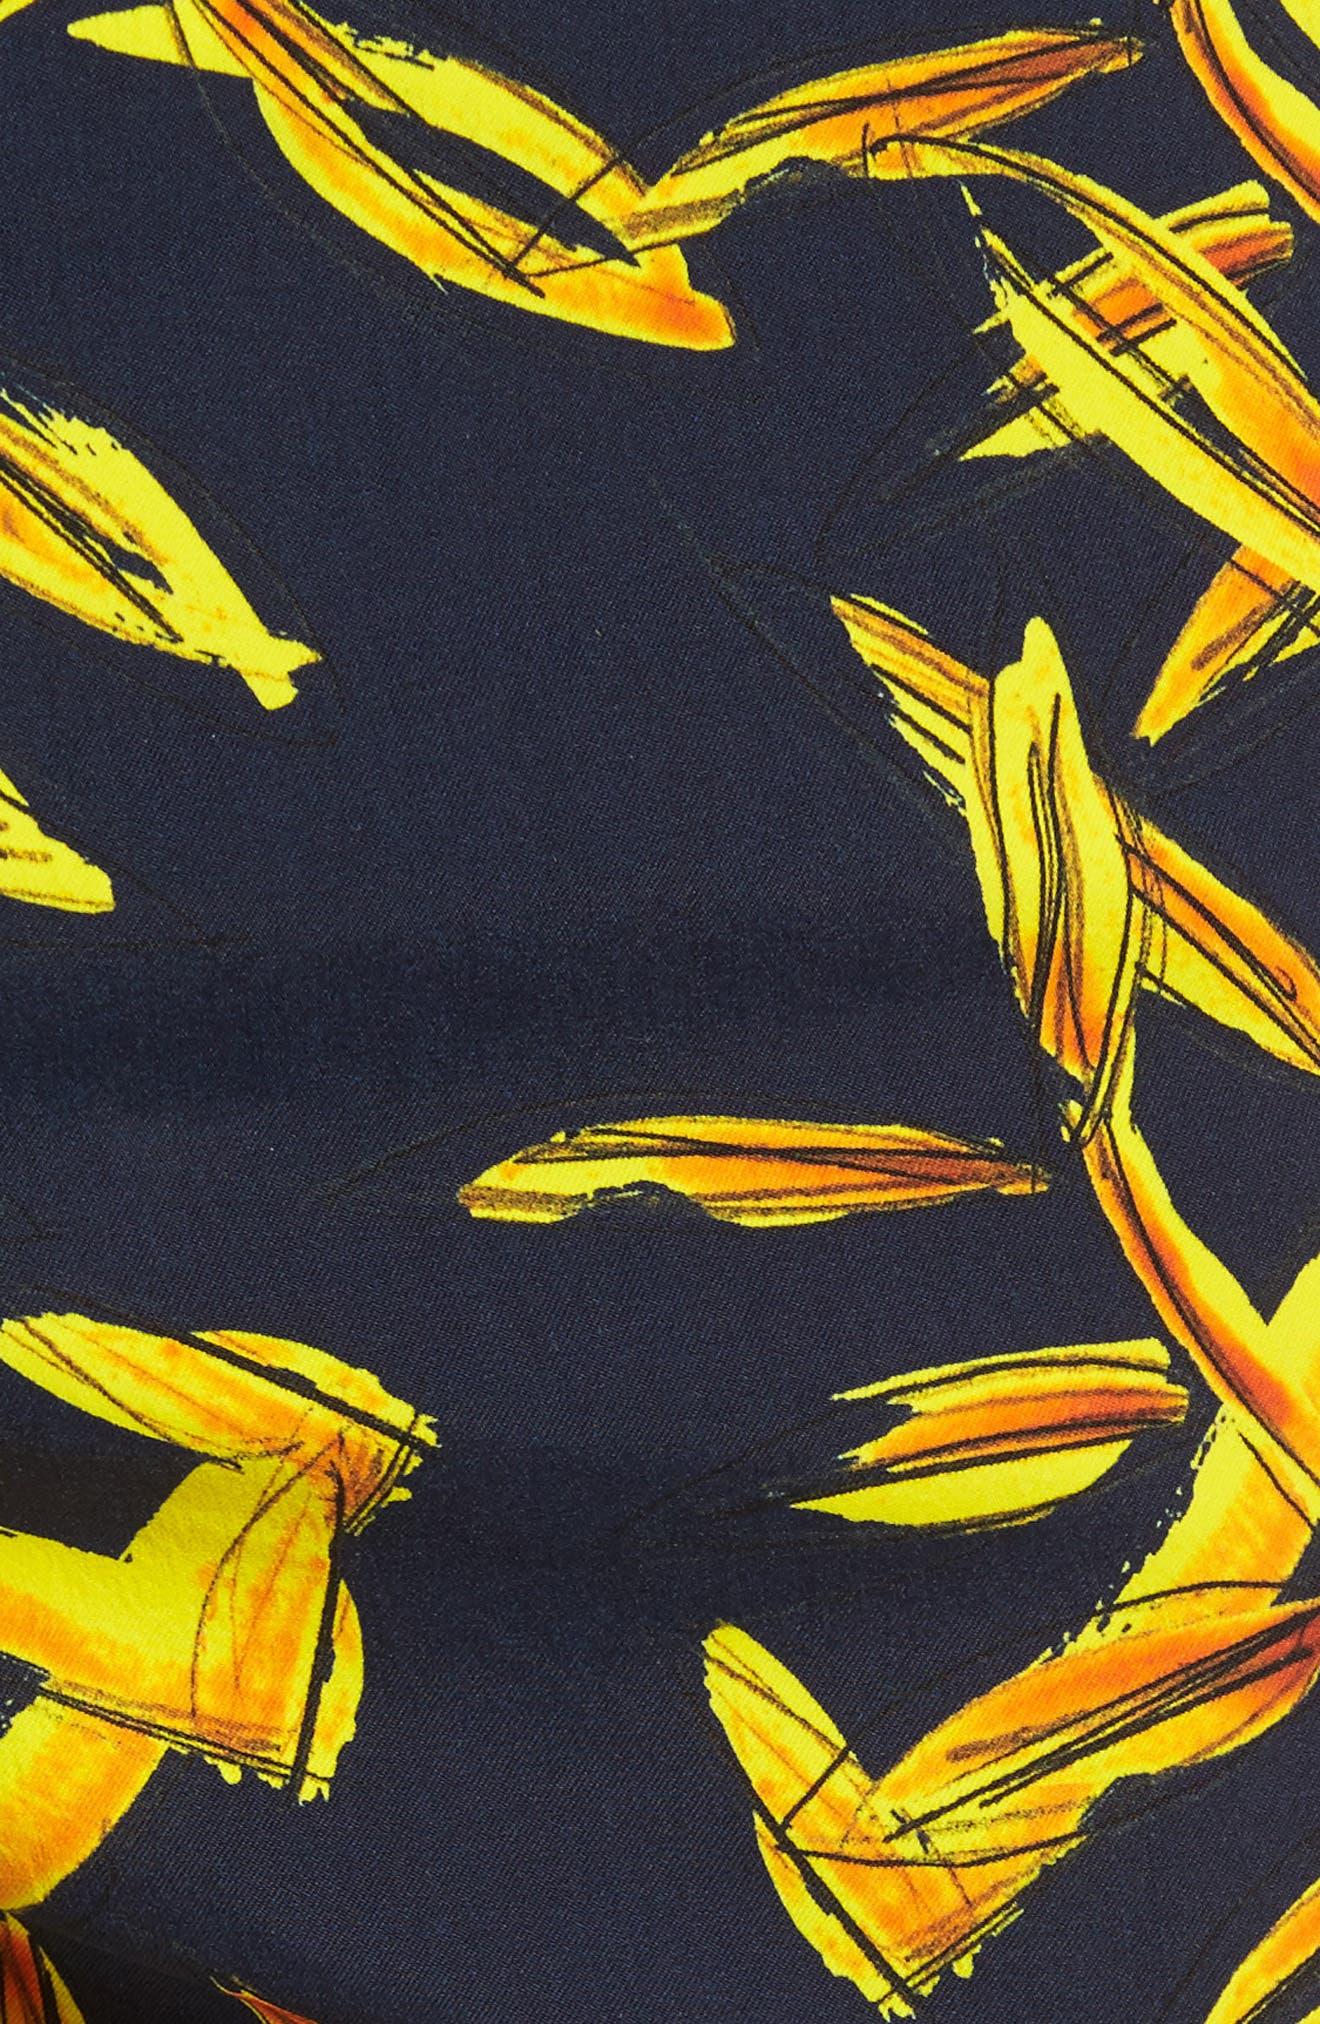 Superflex Gold Palms Print Swim Trunks,                             Alternate thumbnail 5, color,                             NAVY BLUE